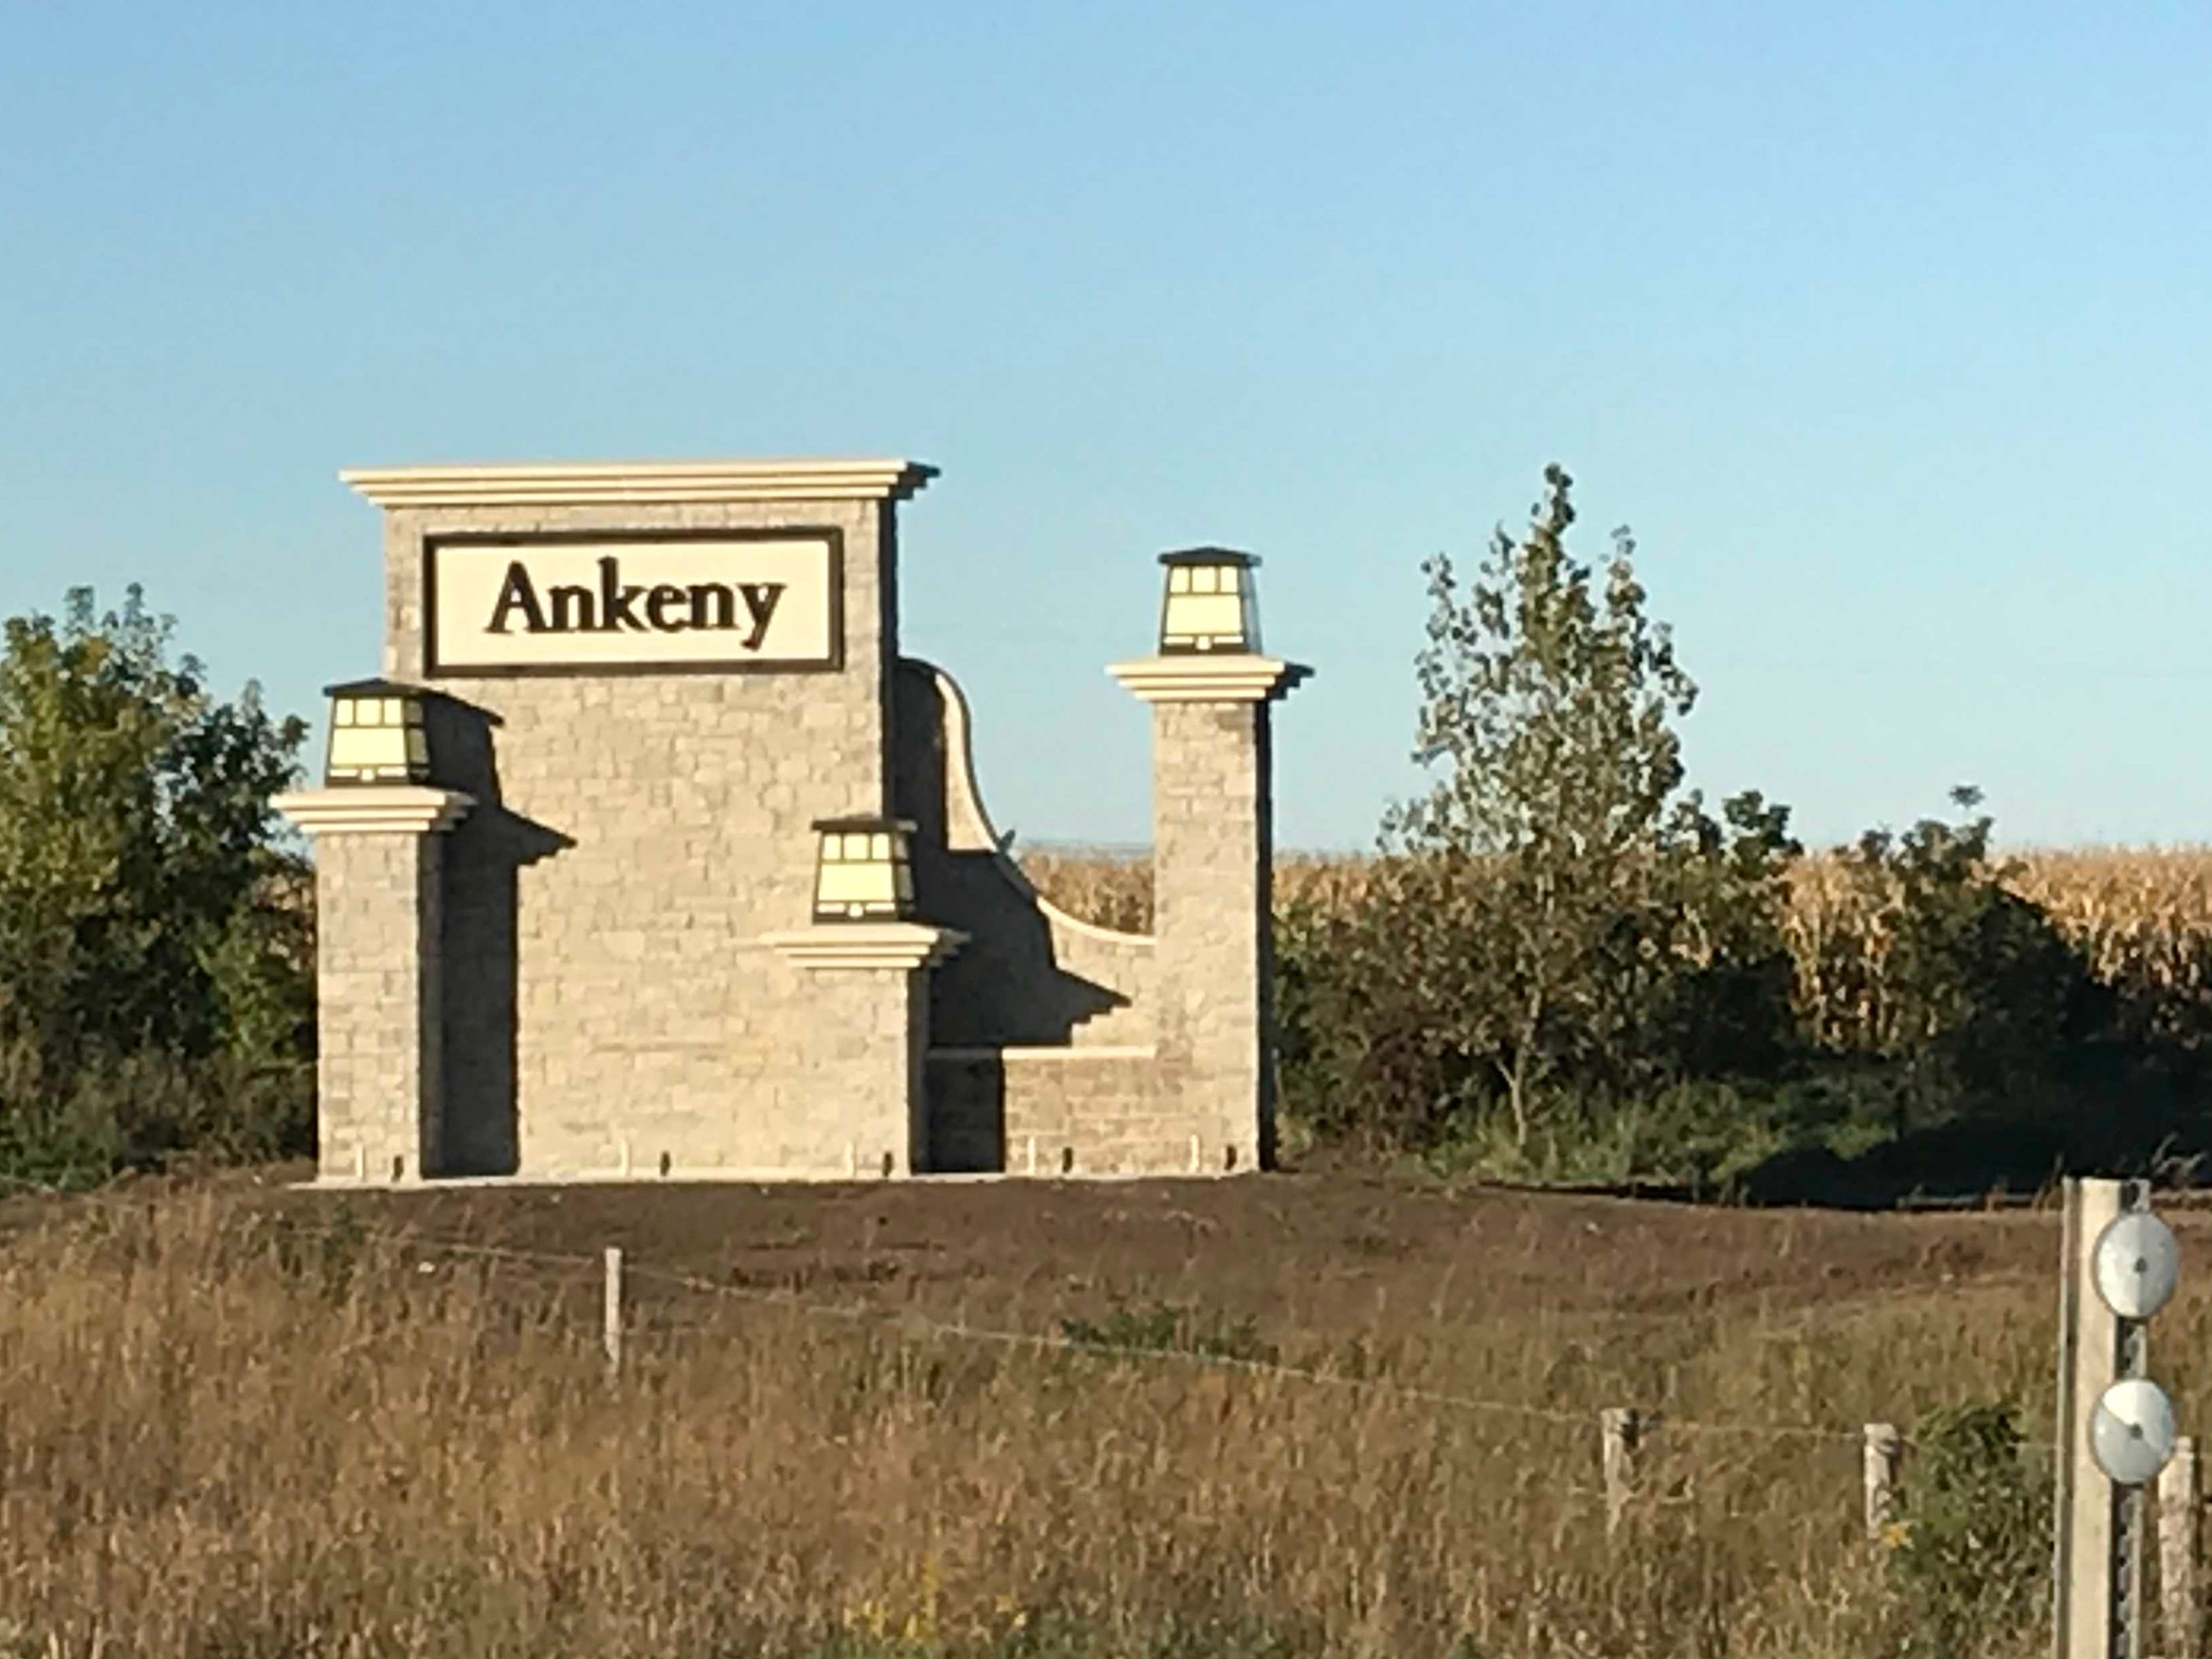 Ankeny Sign